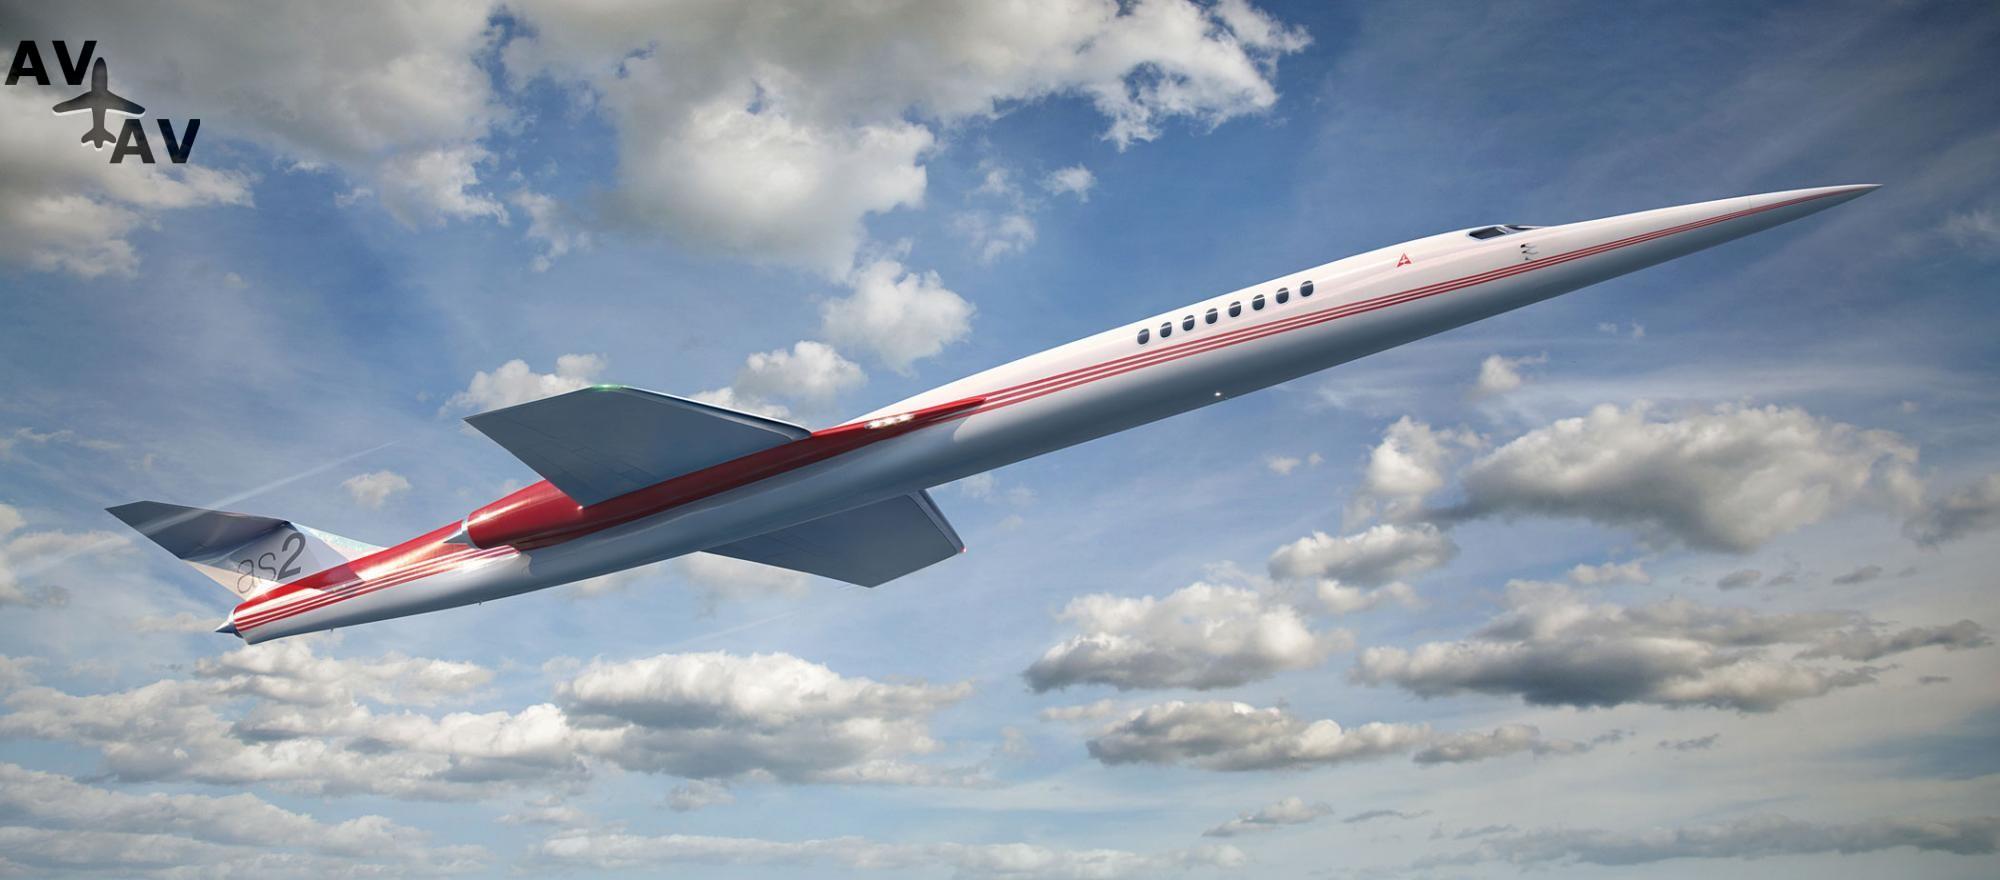 aerion as2 new york hr - Aerion и Lockheed Martin договорились о разработке нового самолета